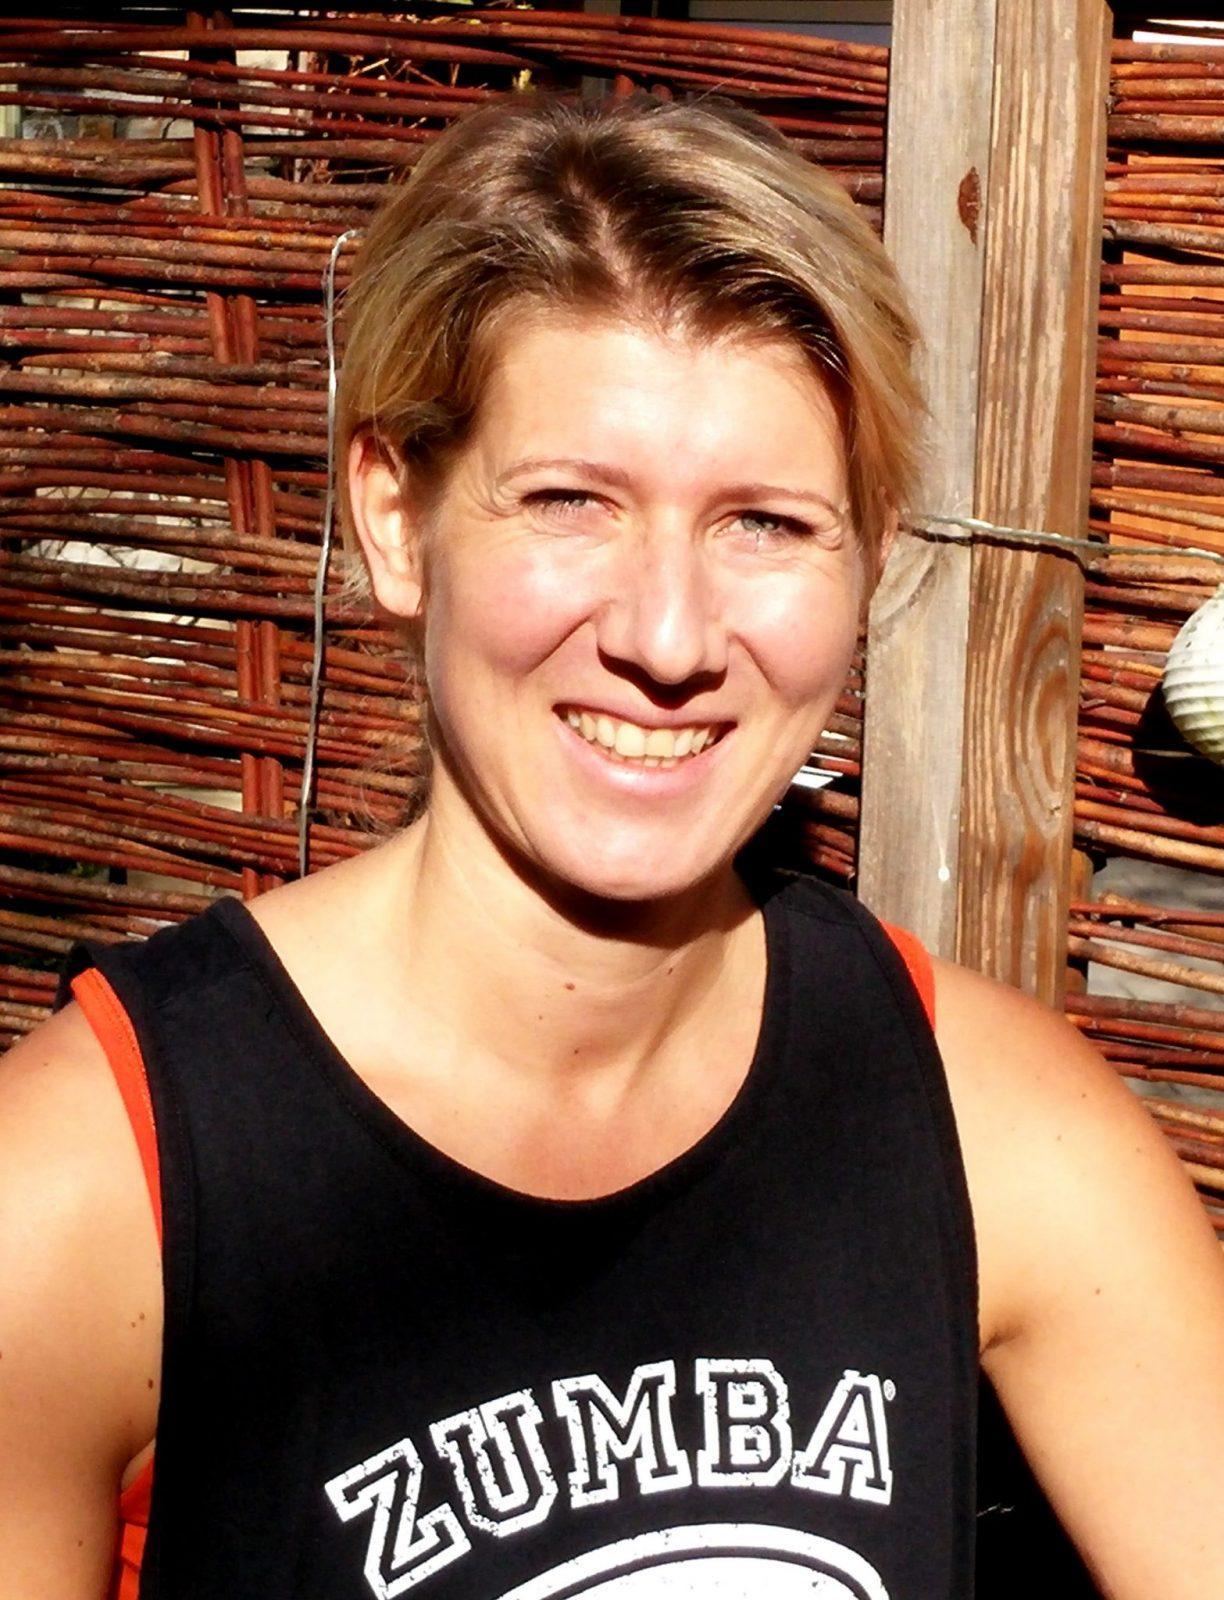 Alexandra Zumba 2AA